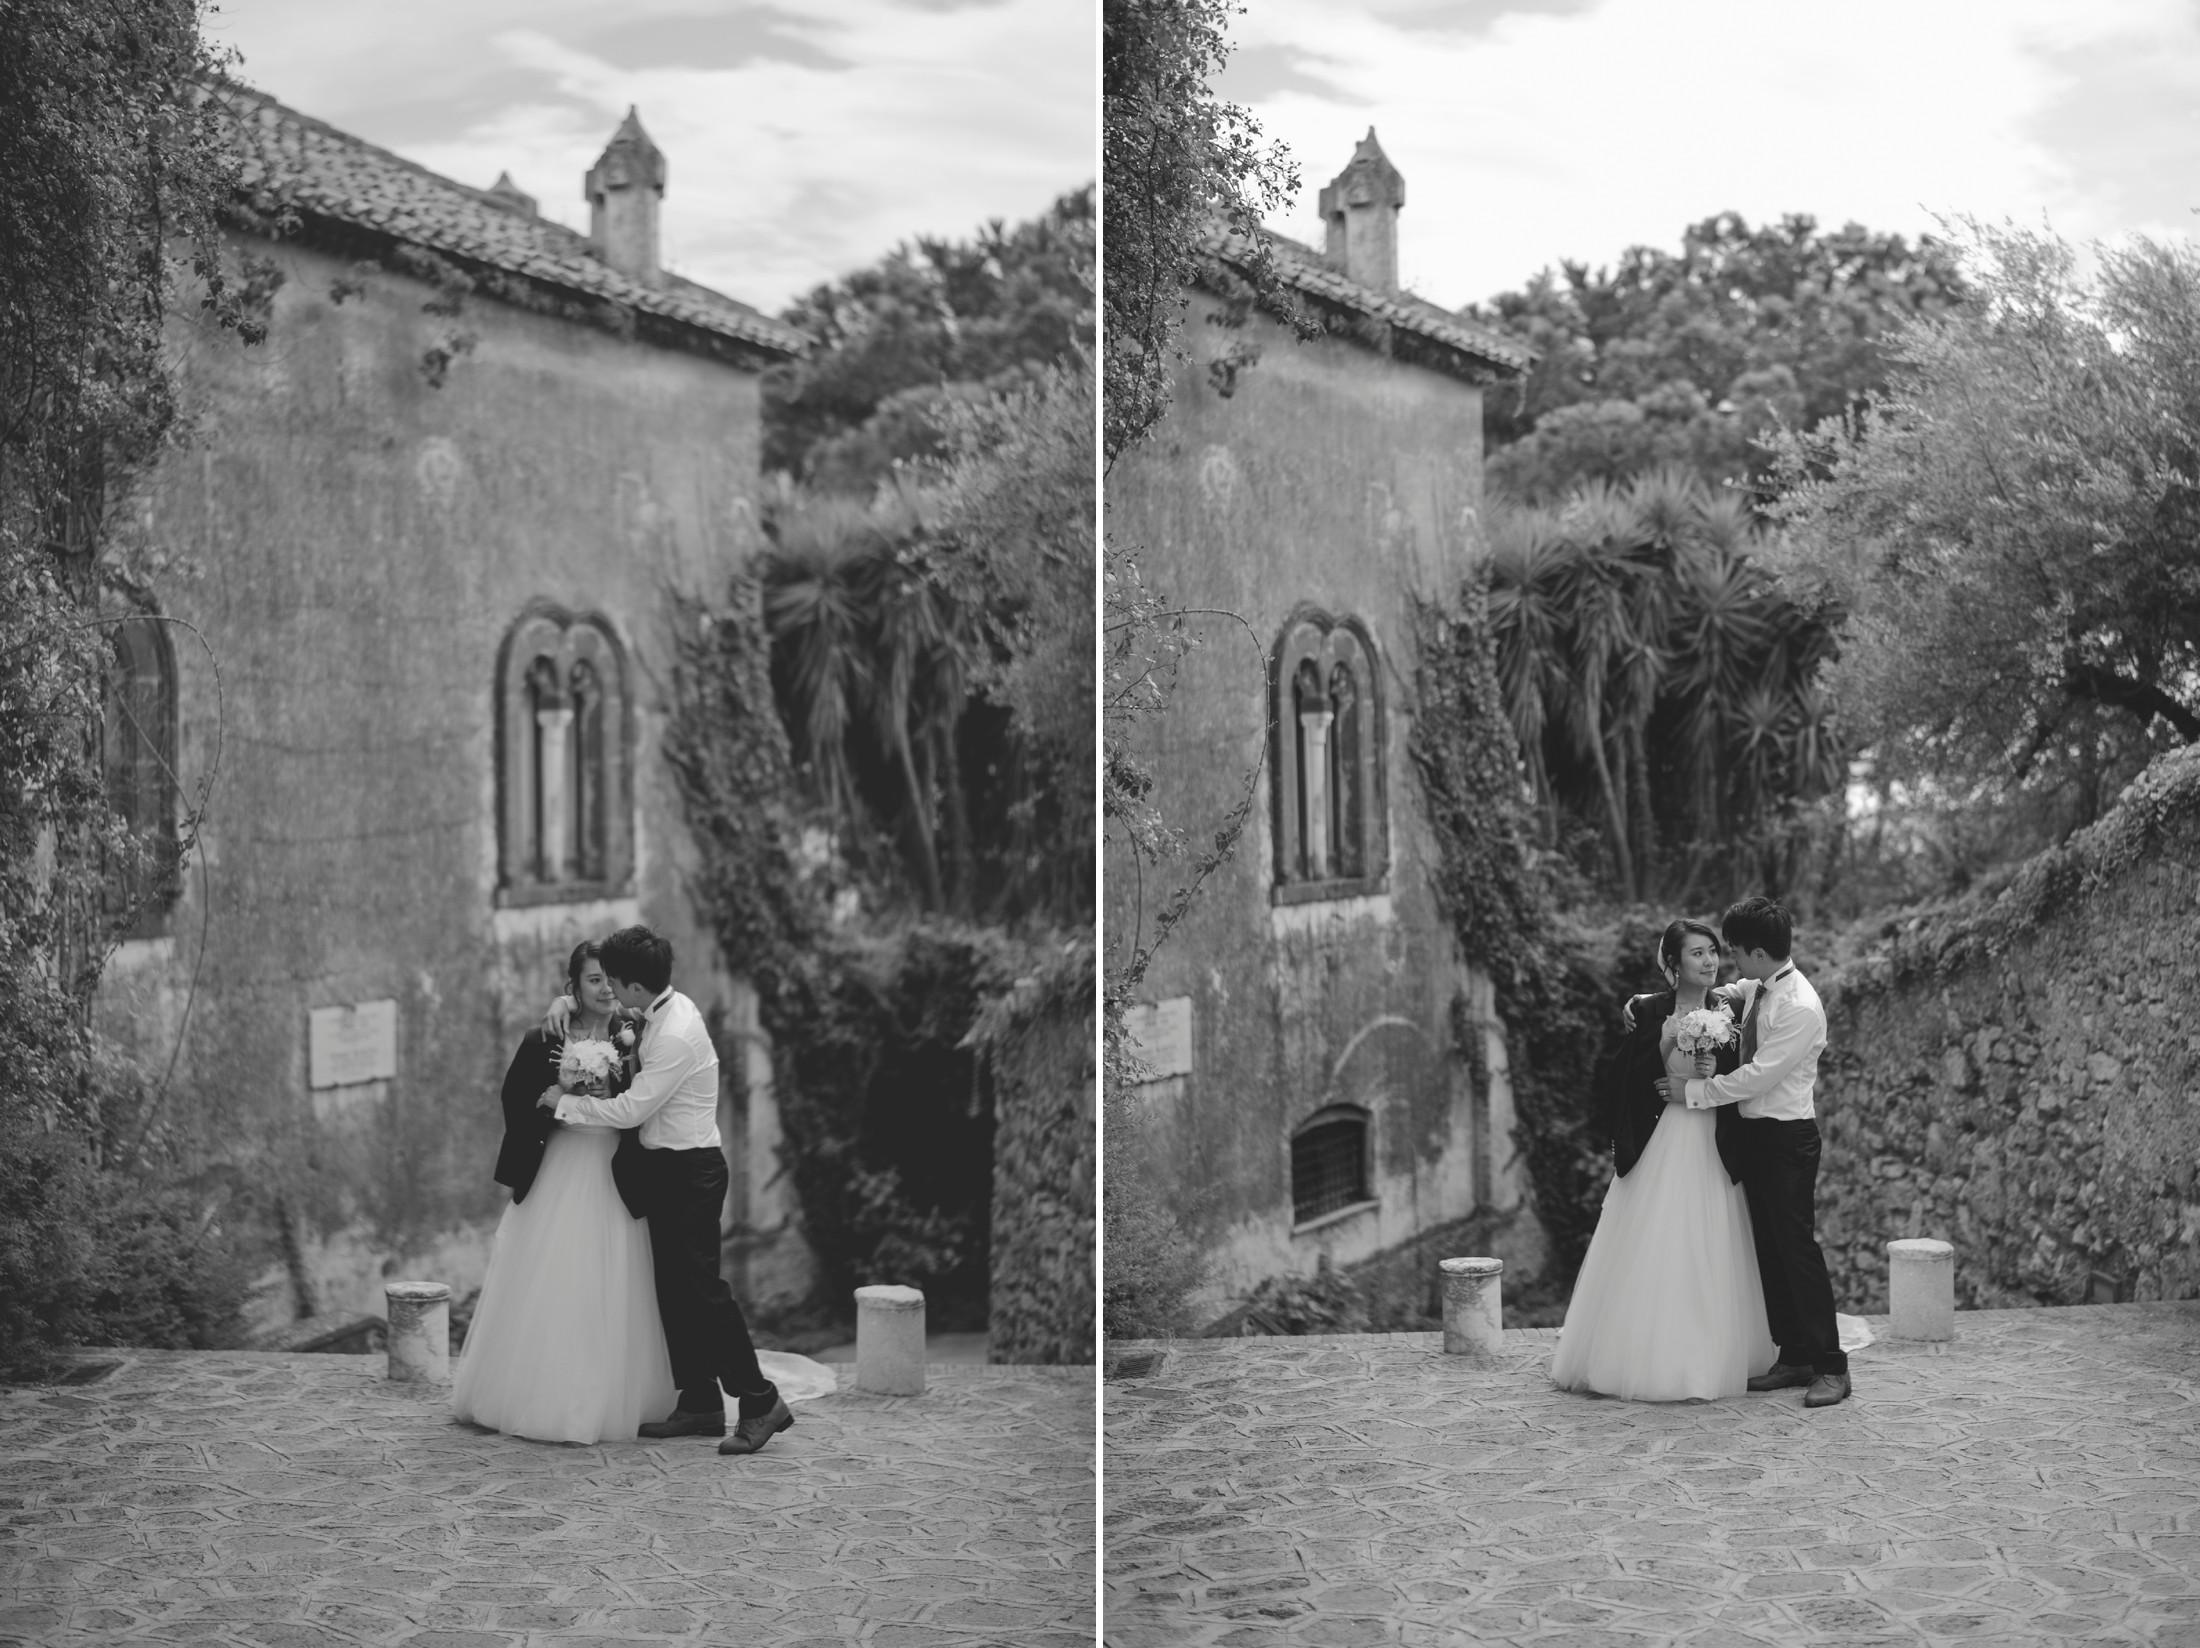 wedding on the amalfi coat bride and groom' s portraits at villa rufolo in ravello